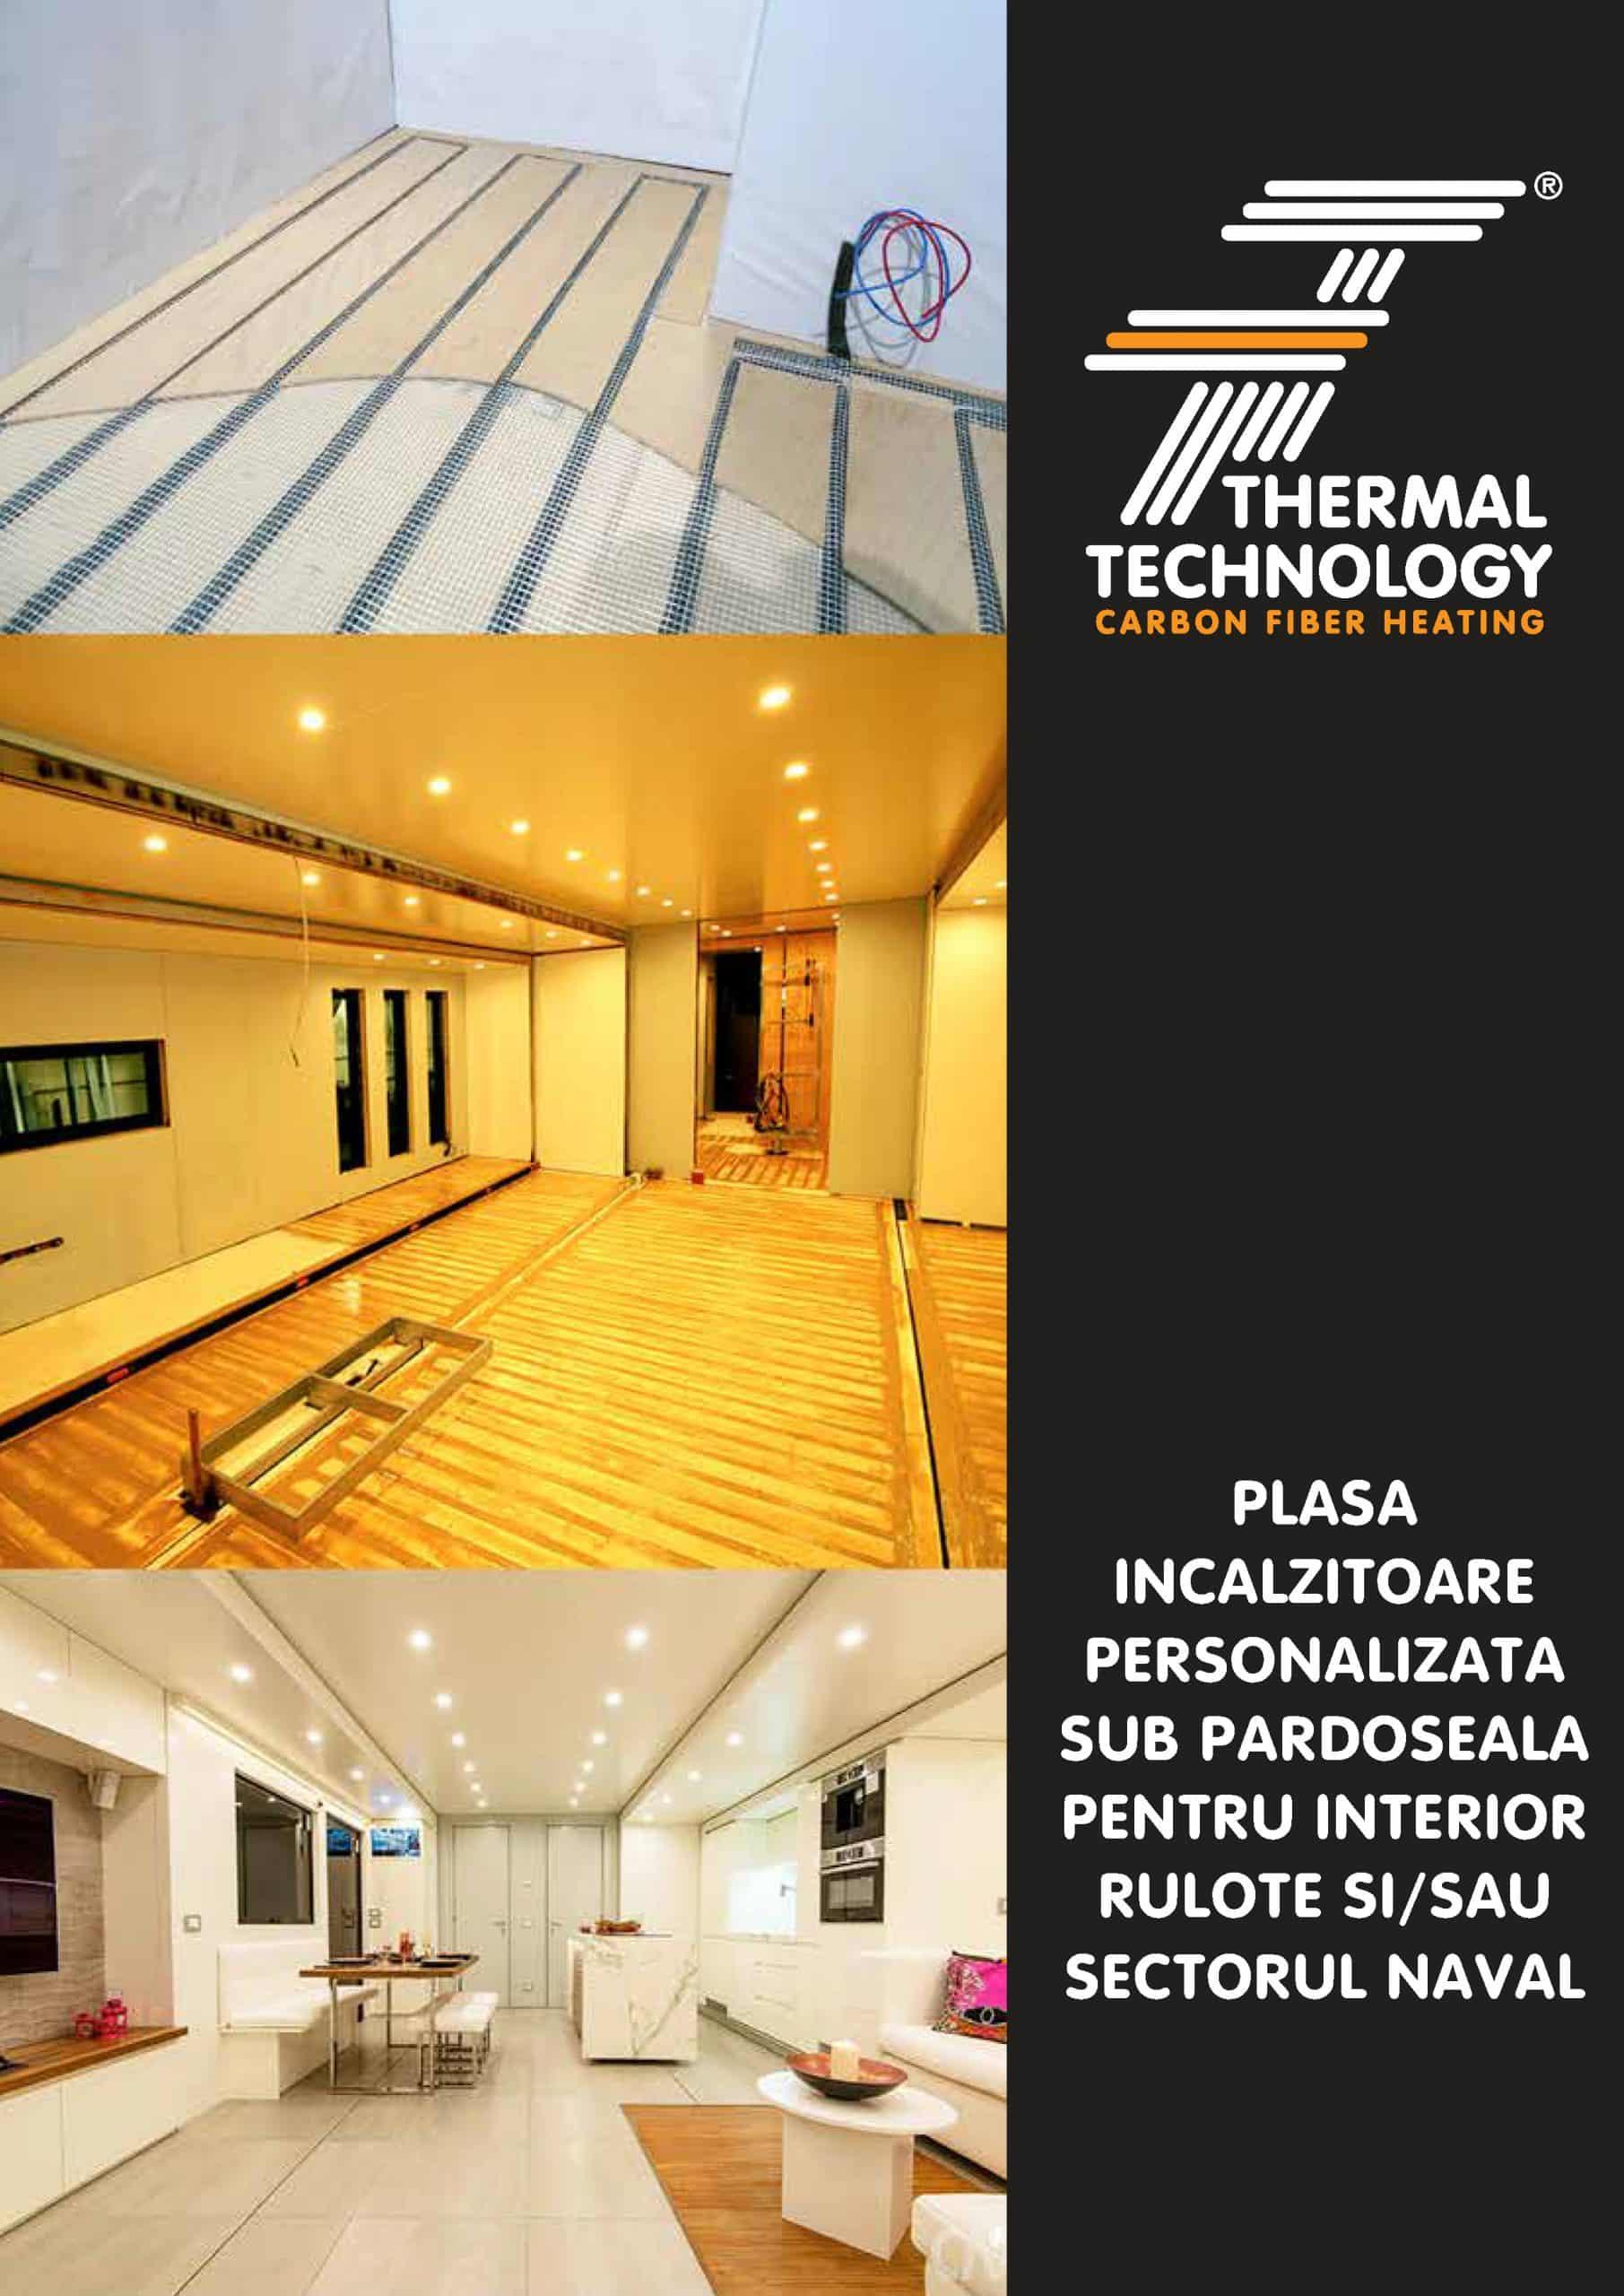 https://thermaltechnology.ro/wp-content/uploads/2020/03/PVRC_RO_Pasa-incalzitoare-Personalizata-sub-pardoseala-pentru-Rulote_Sectorul-Naval_Page_1-scaled.jpg